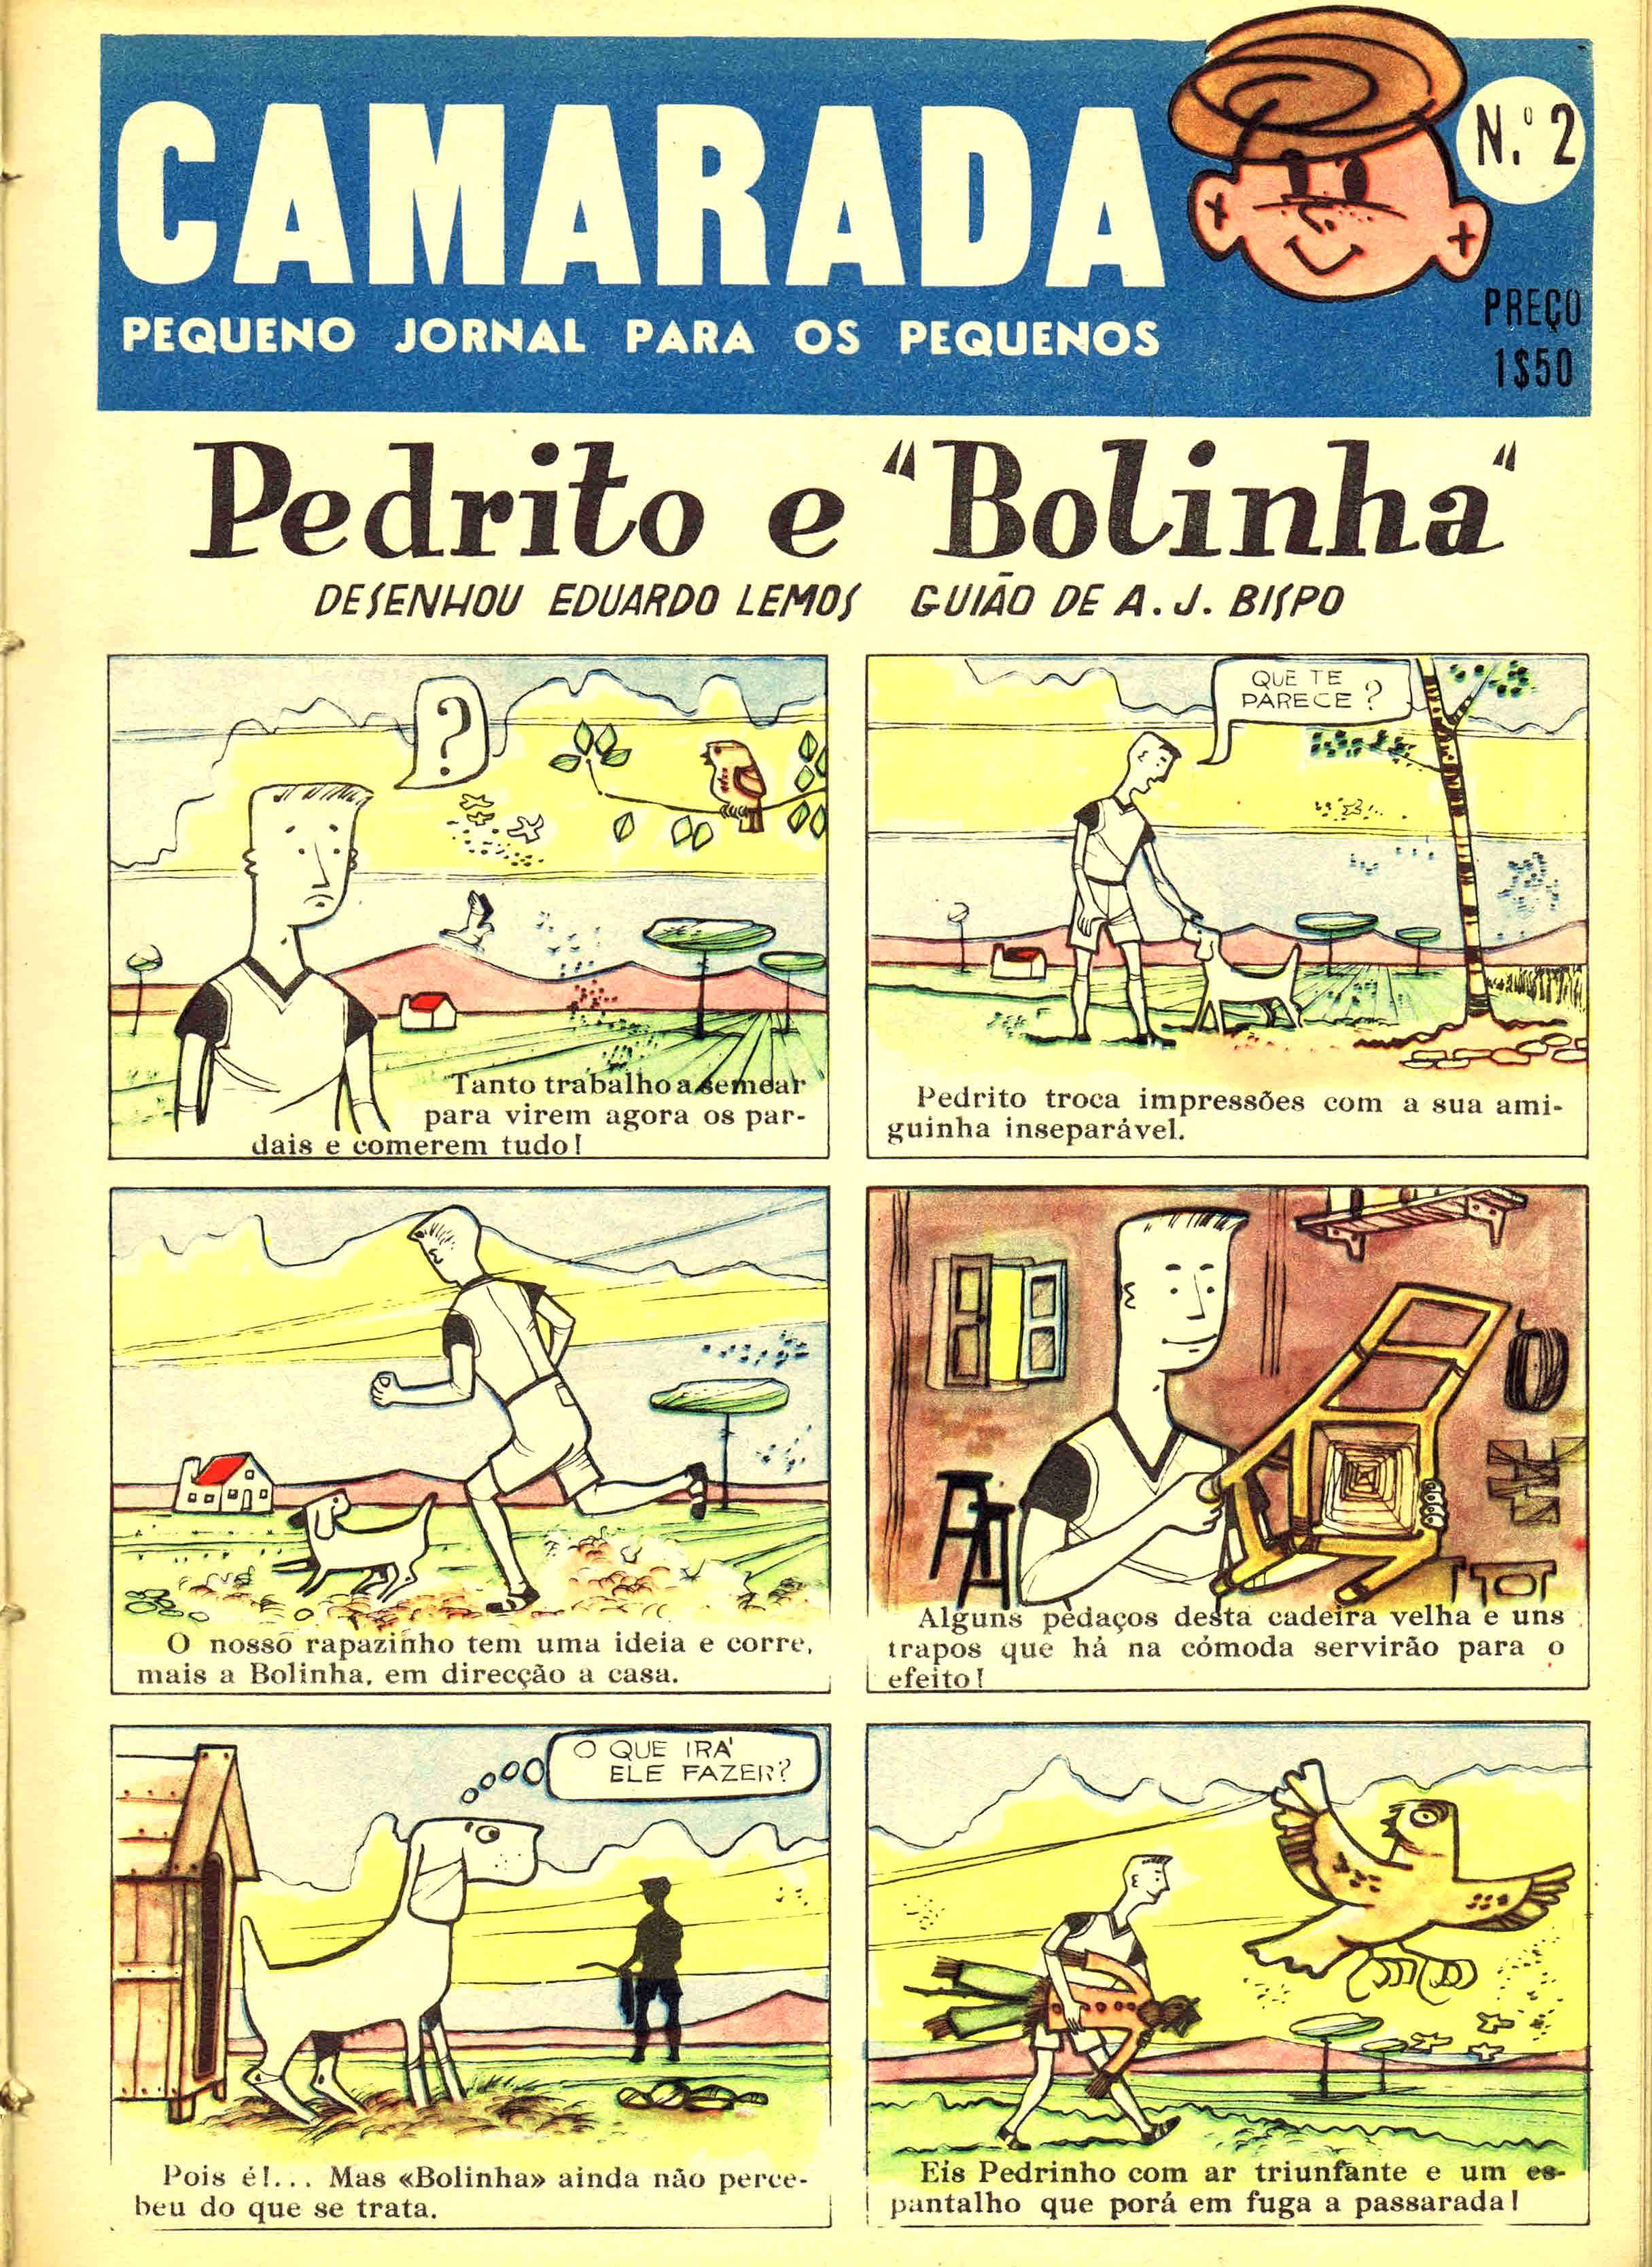 camarada mocidade portuguesa nº 2 1958